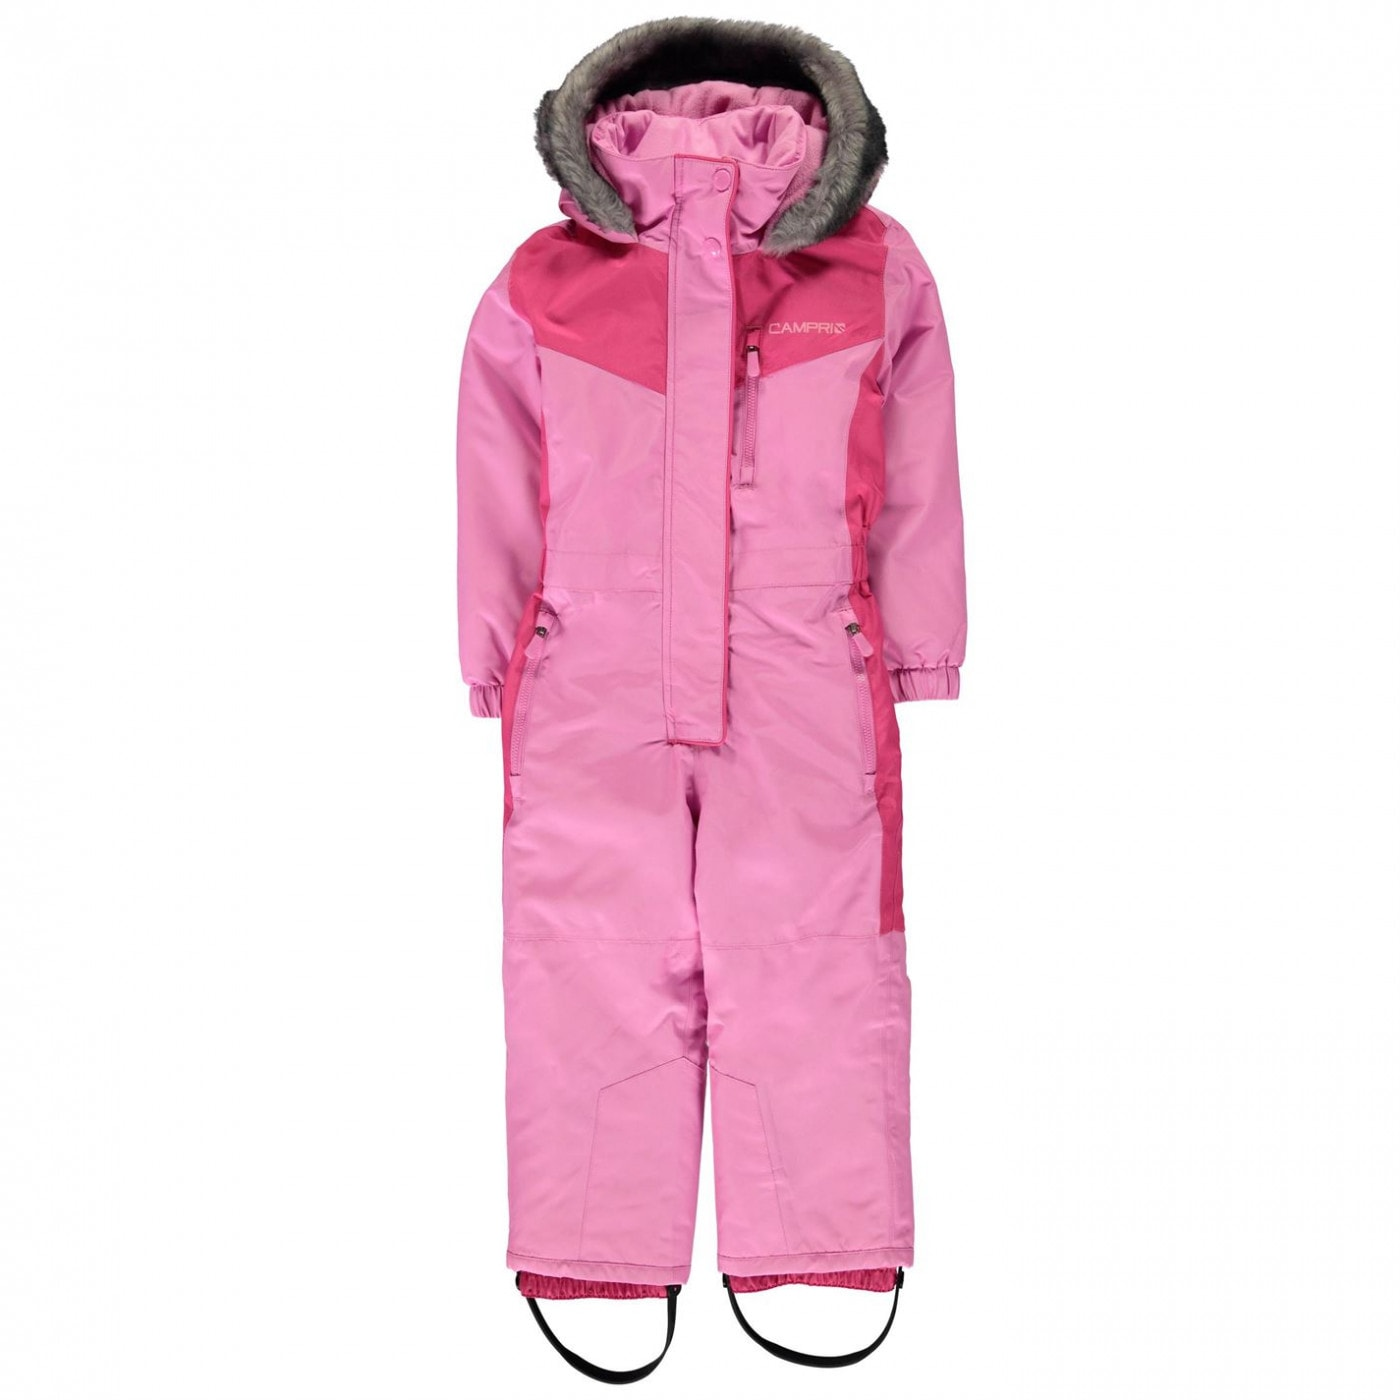 Campri Ski Suit Infants